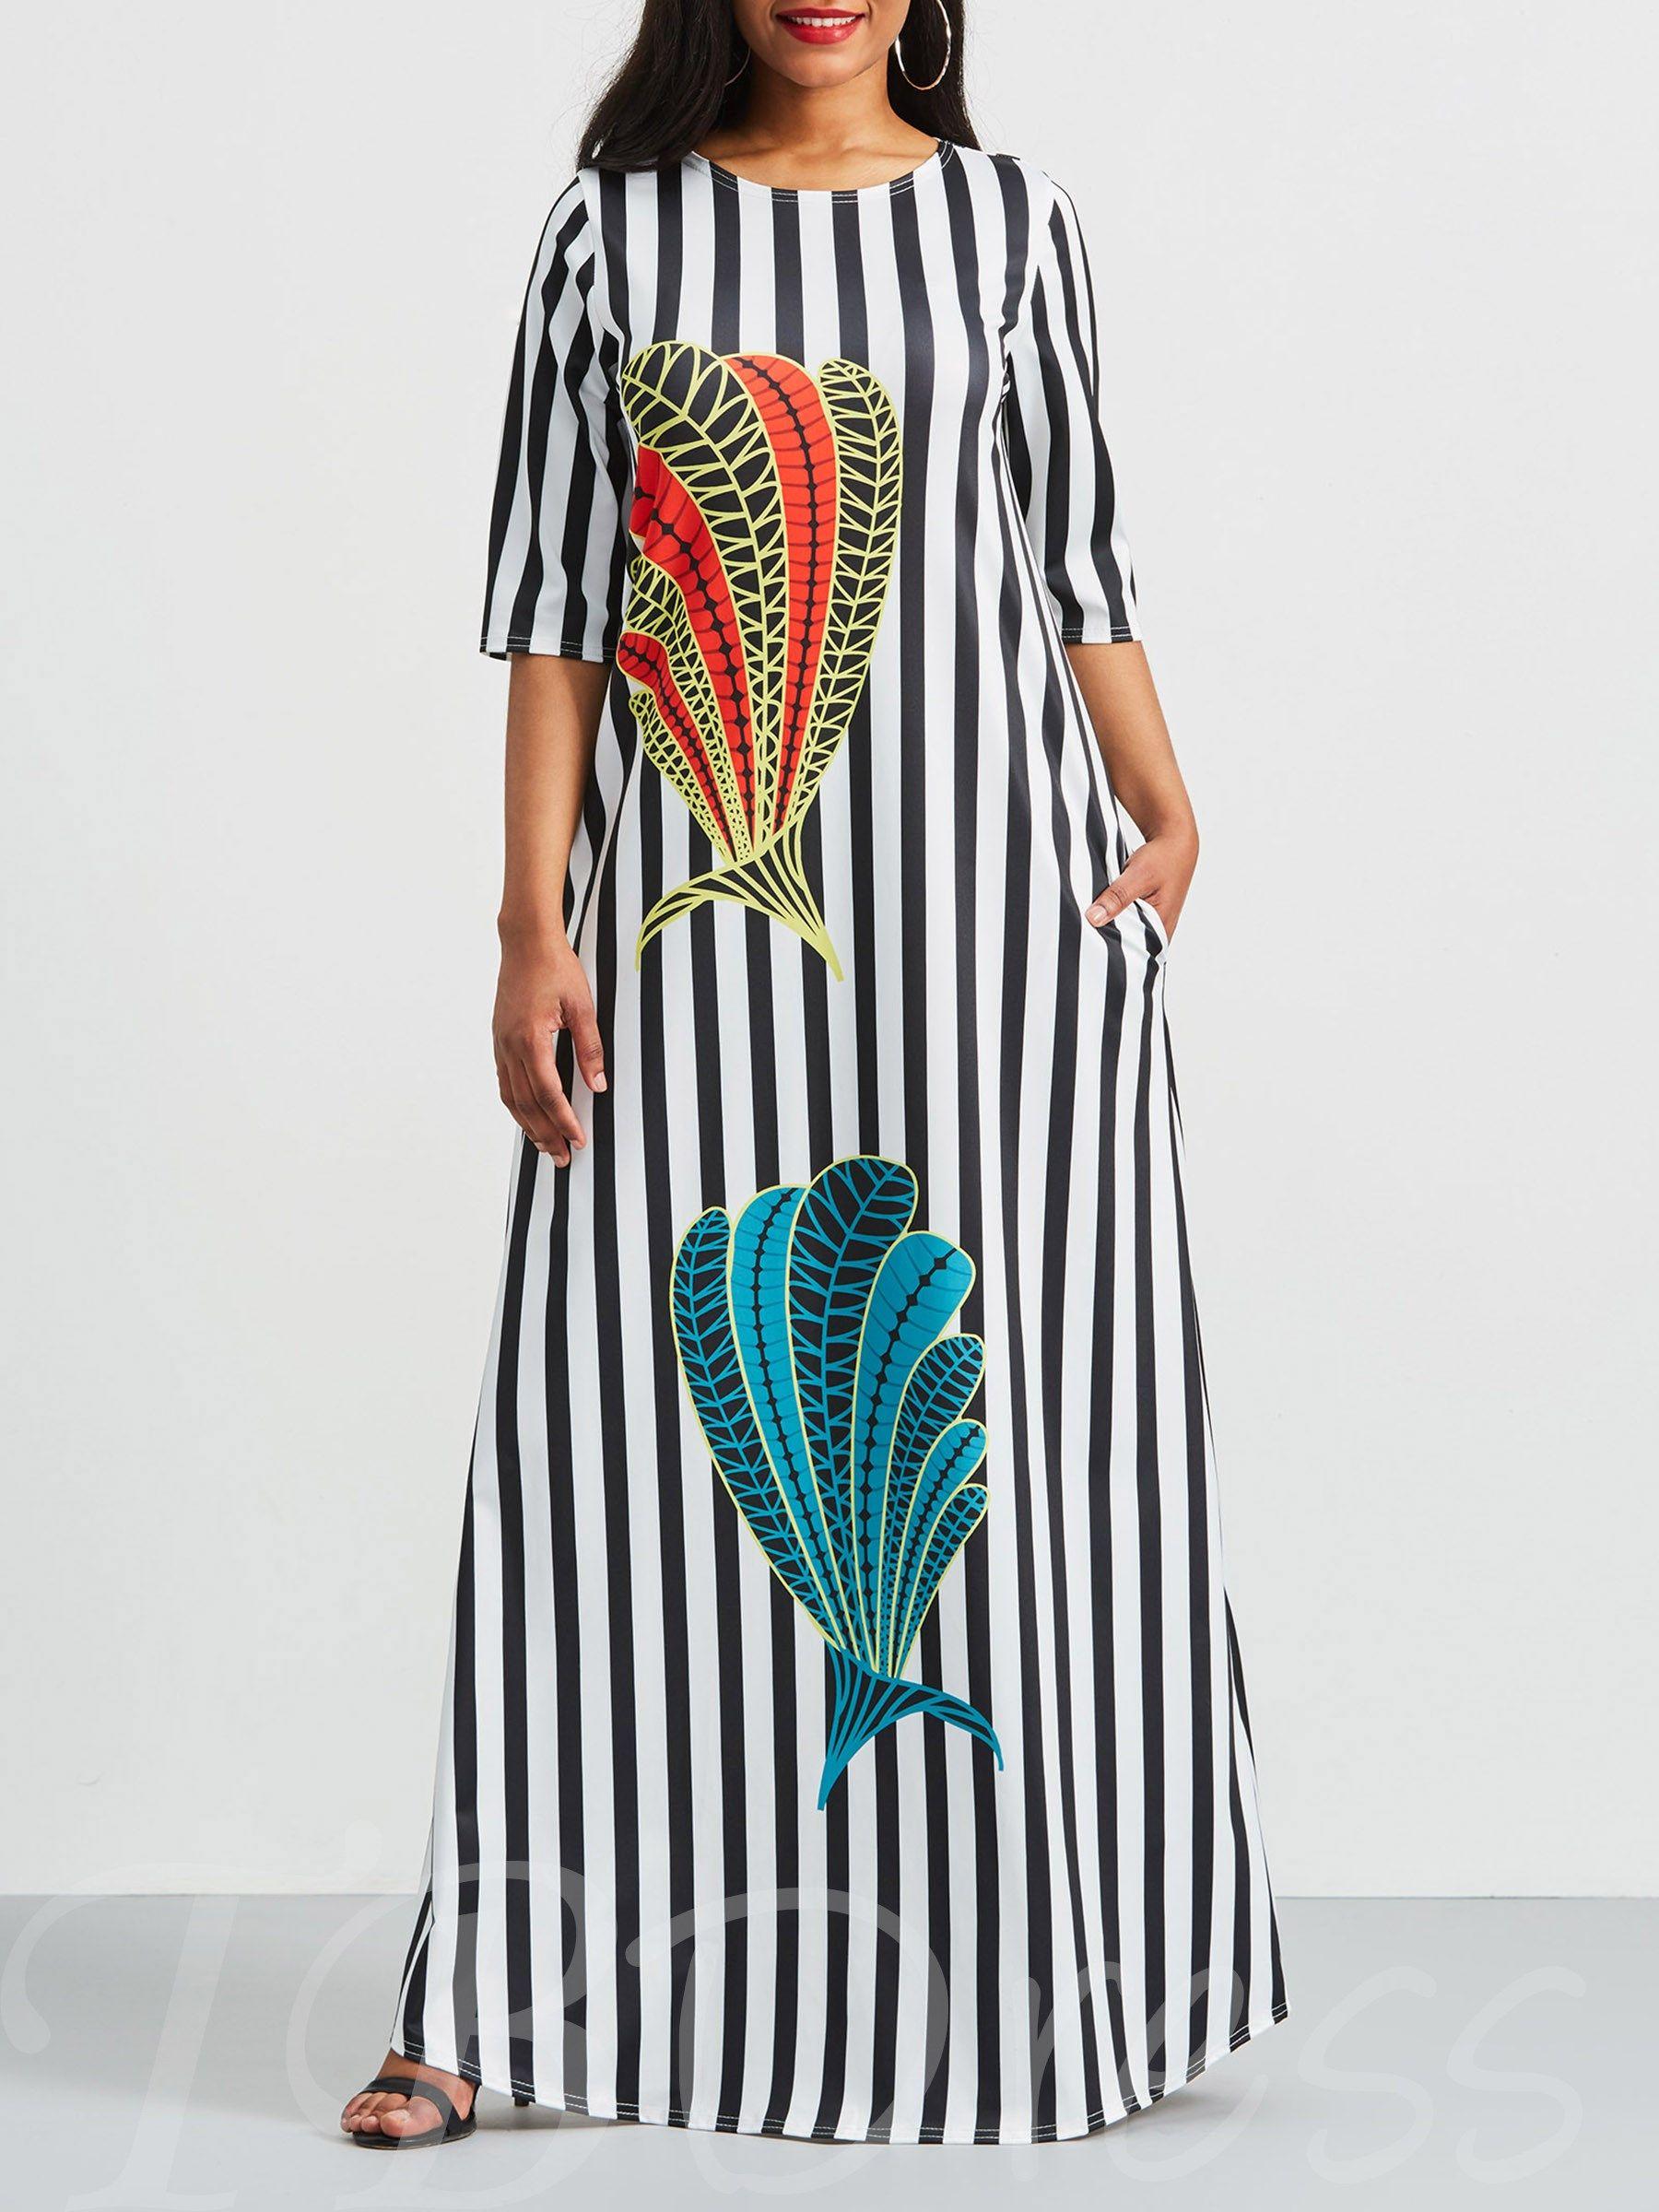 3 4 Length Sleeve Prints Color Block Maxi Dress Color Block Maxi Dress Maxi Dress Printed Casual Dresses [ 2400 x 1800 Pixel ]